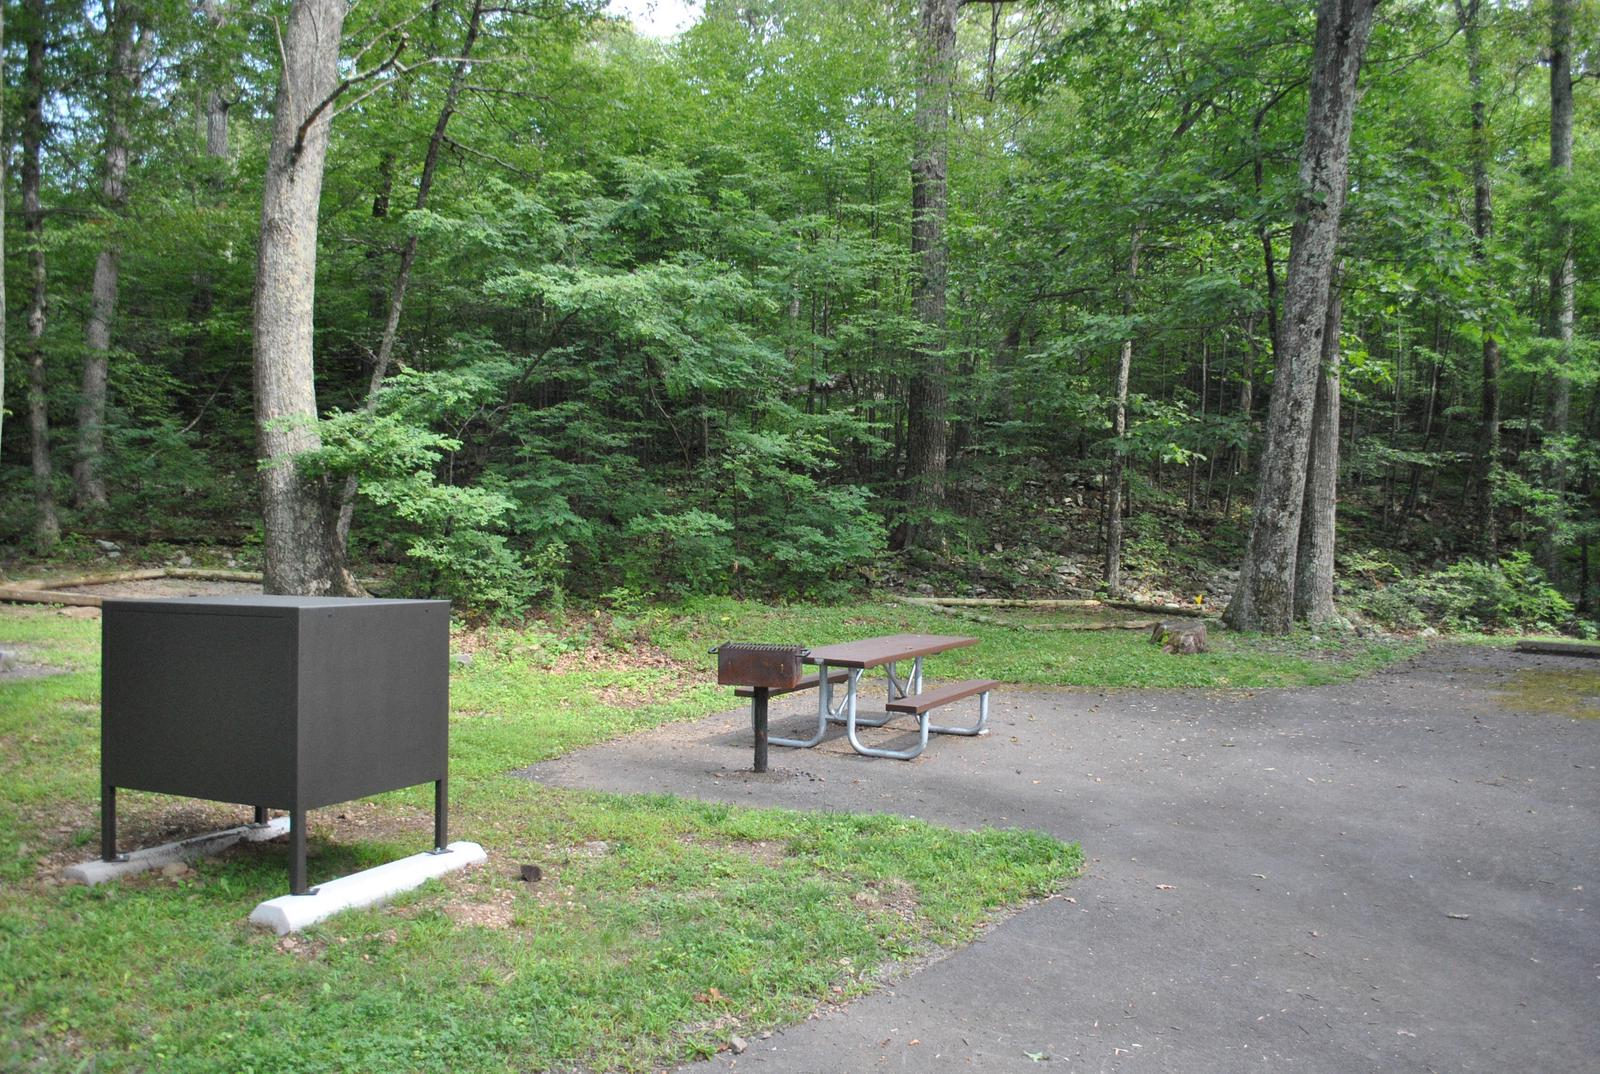 Mathews Arm Campground - Site B127